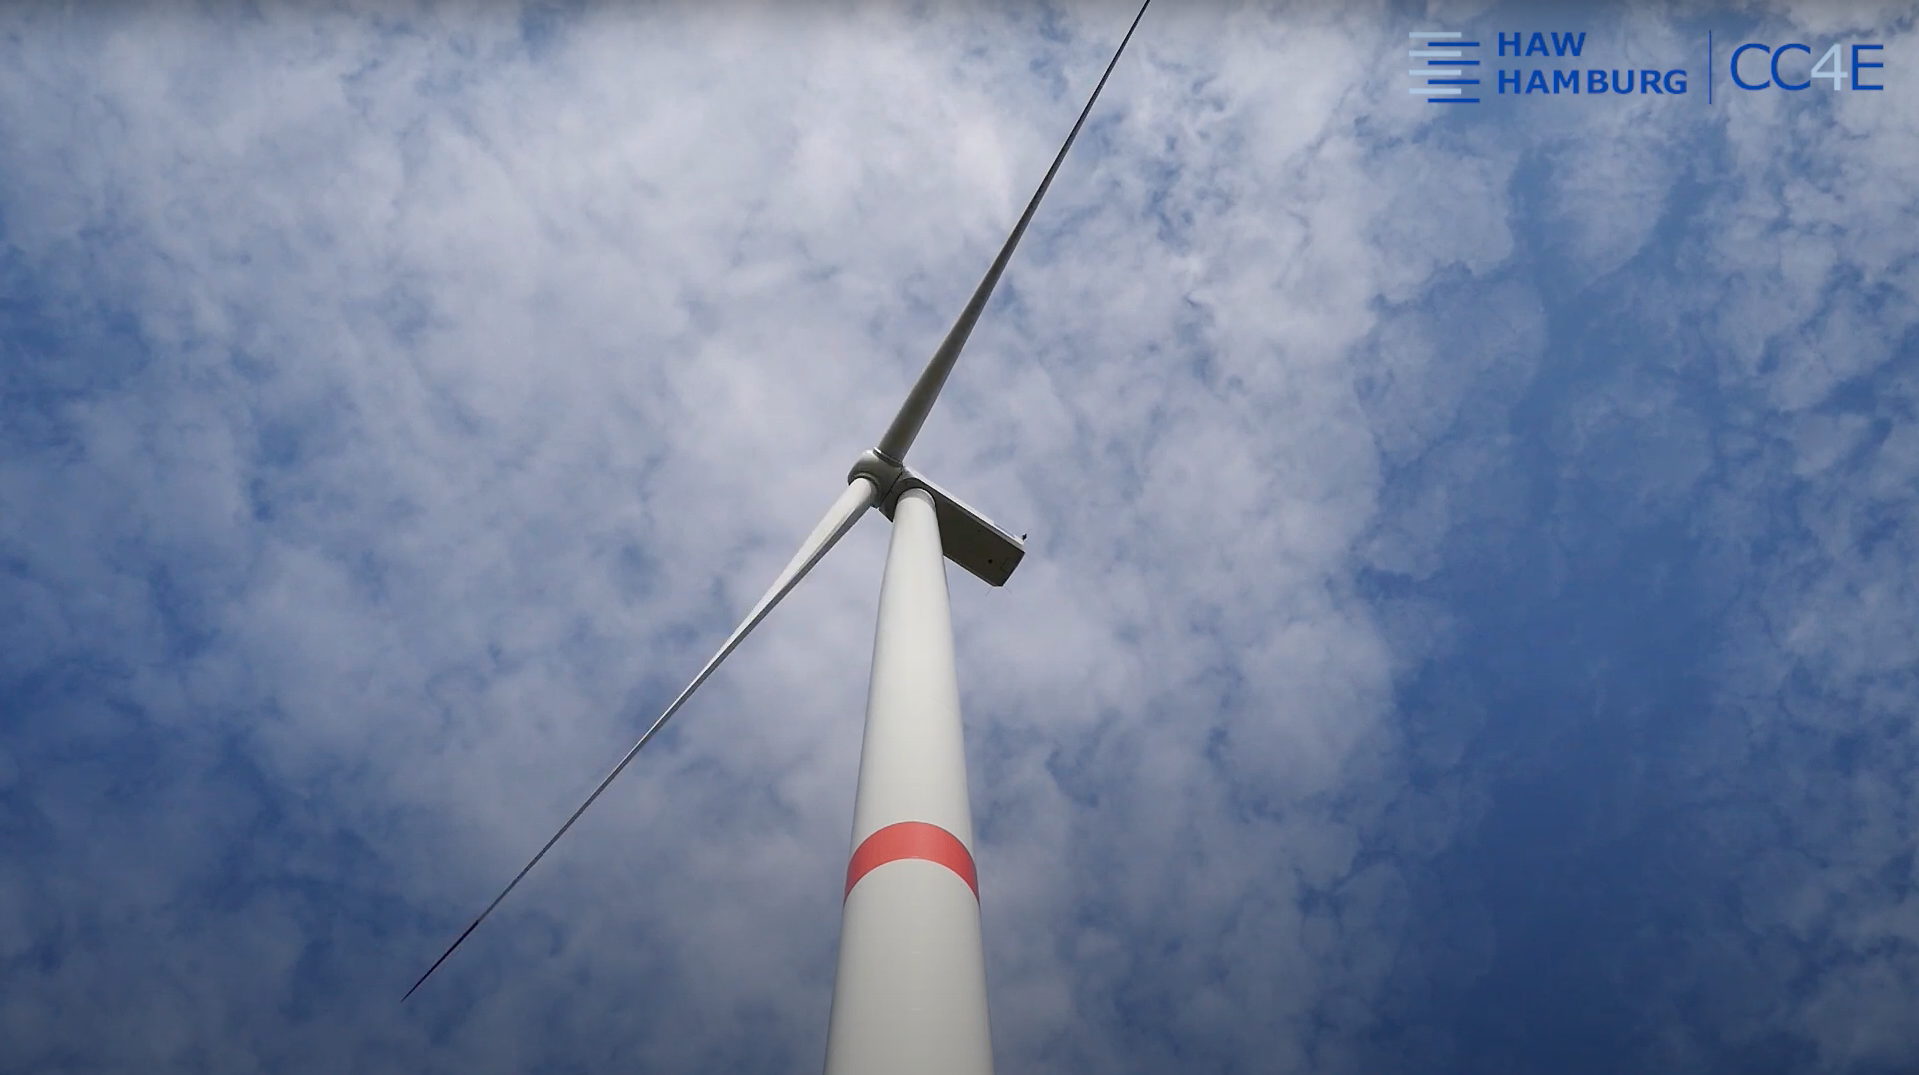 Virtueller Ausflug in den Windpark Curslack